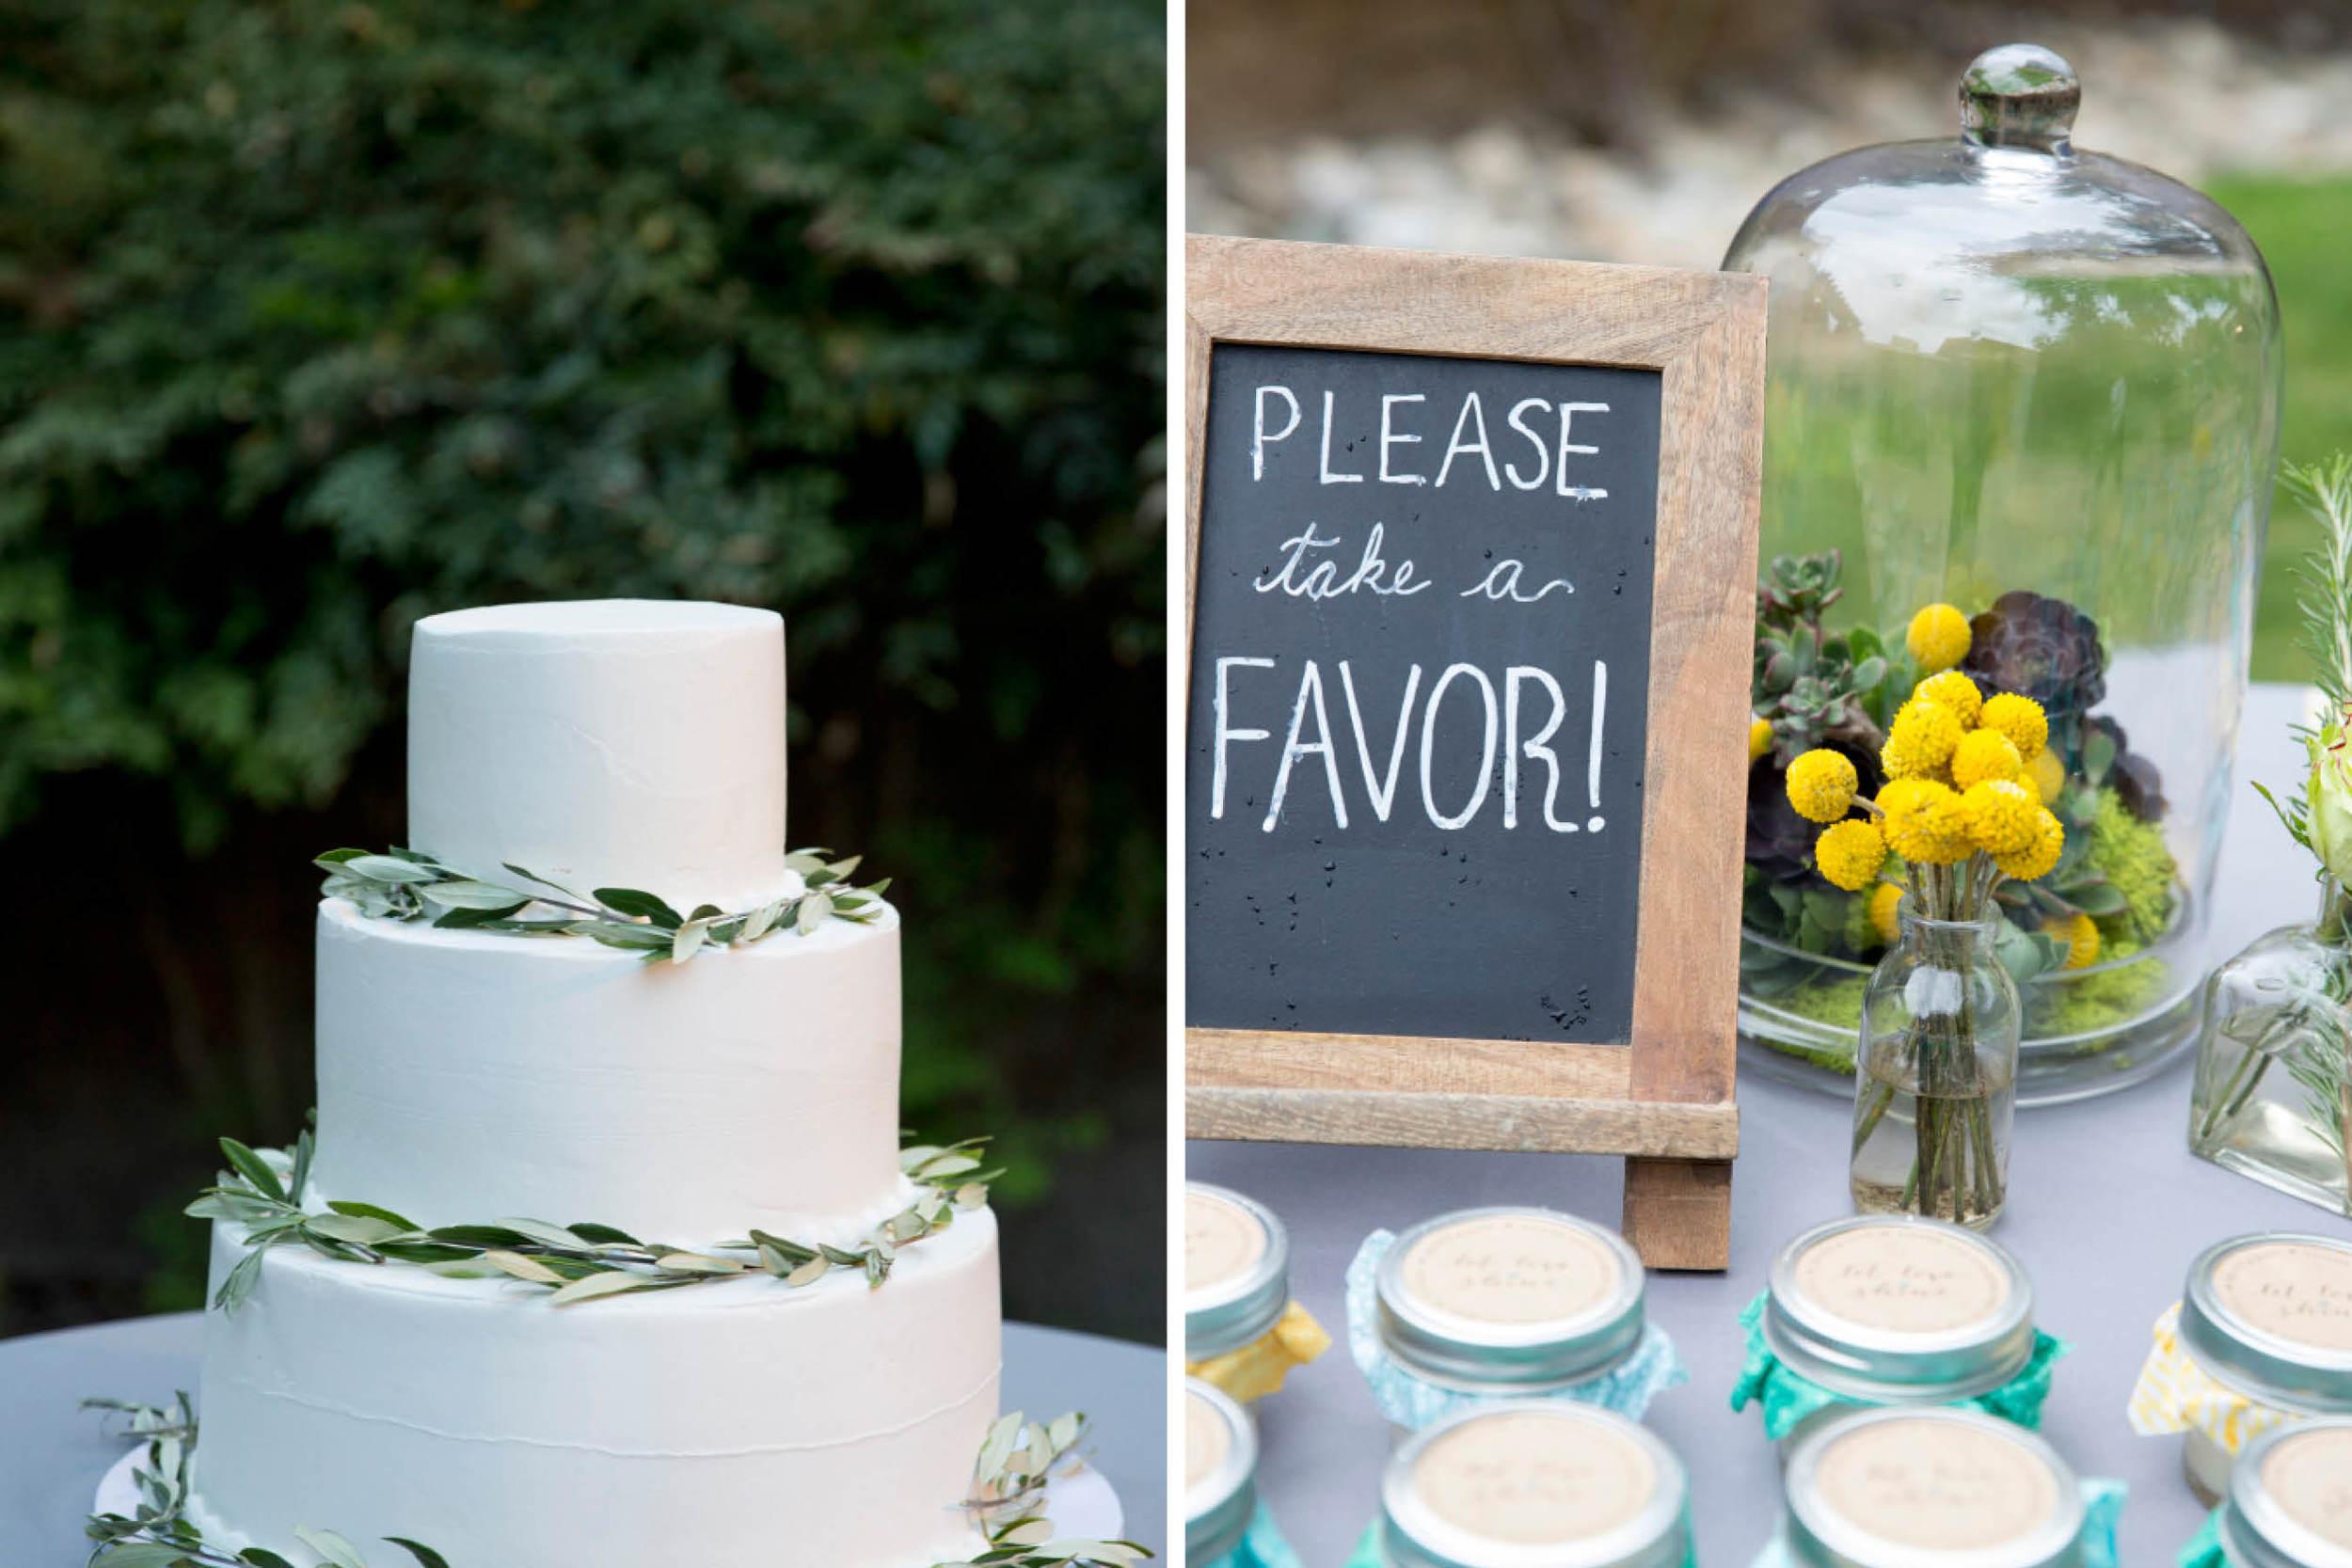 firestone-winery-vineyard-wedding-planner-coordinator-santa-barbara-ynez-los-olivos (28).jpg